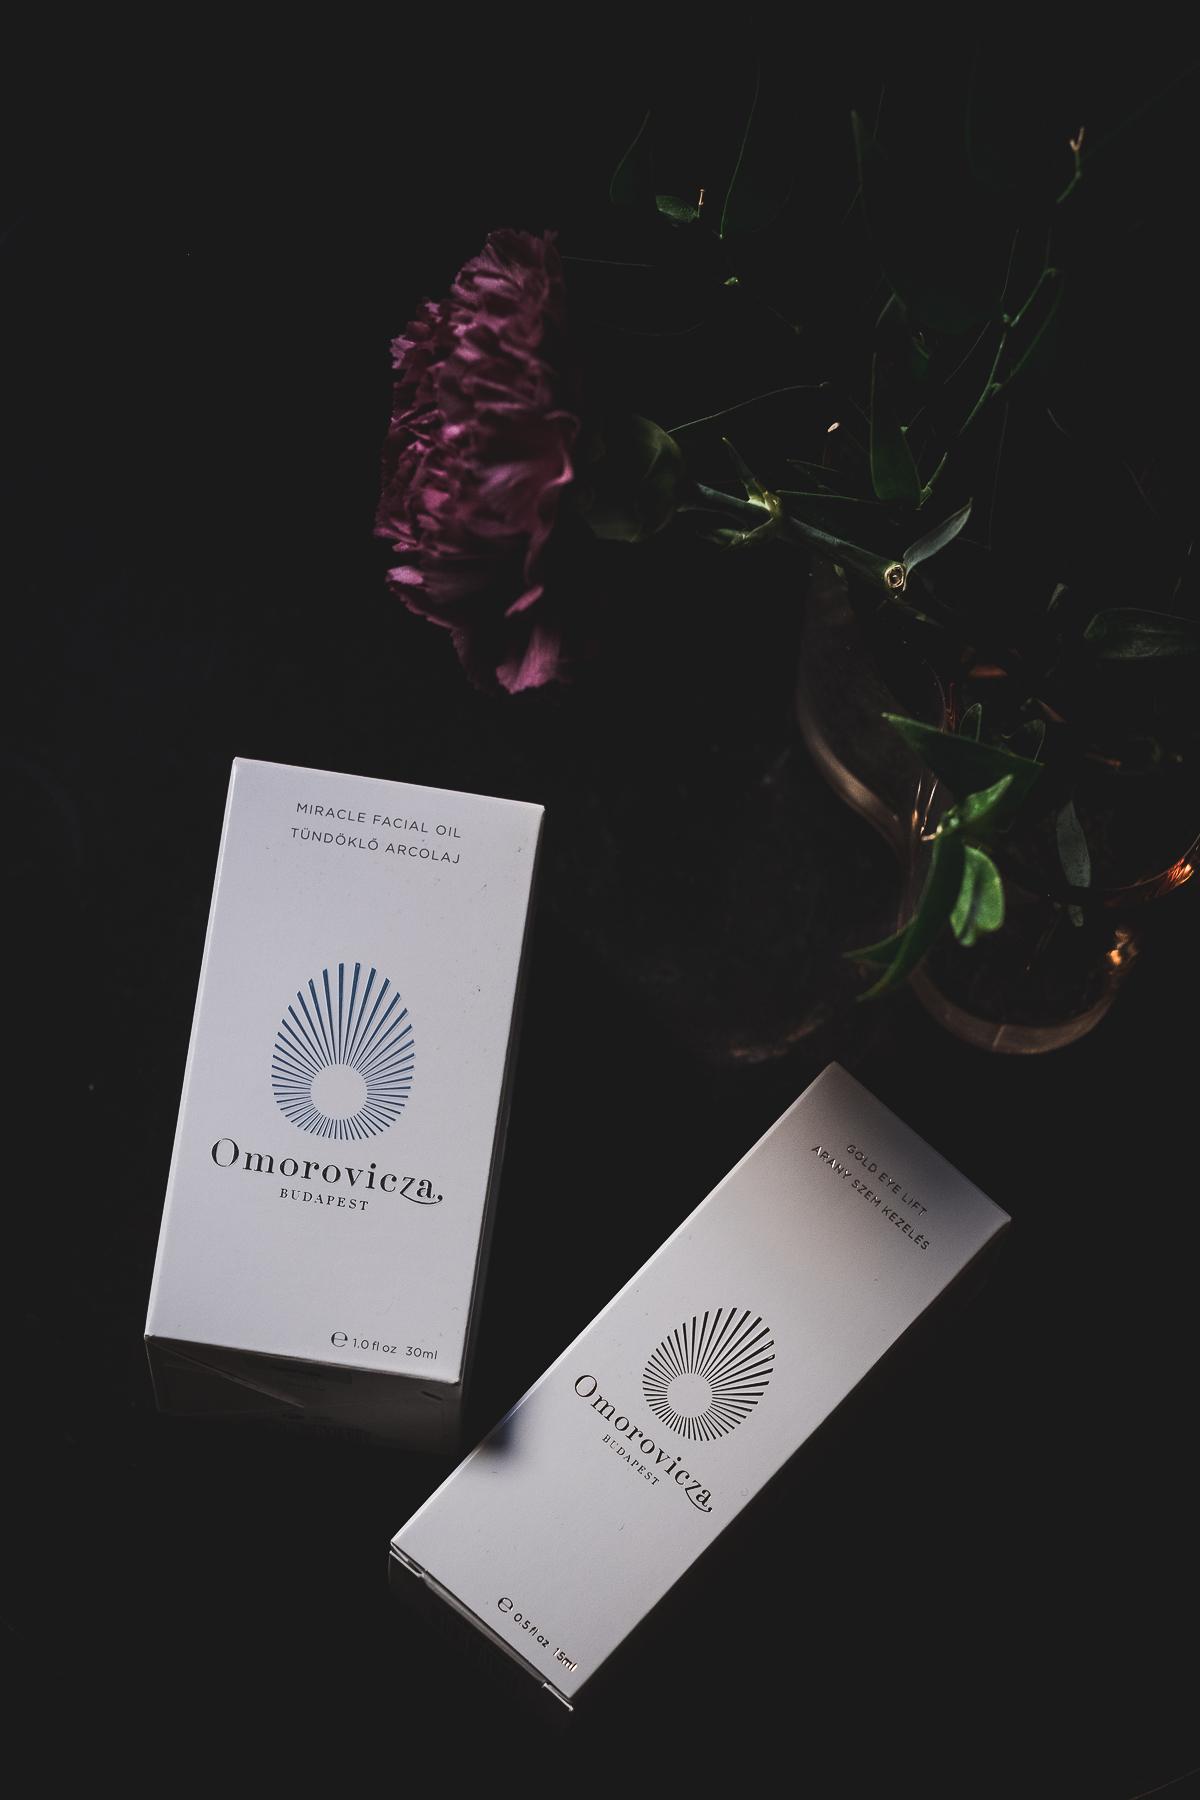 Omorovicza Miracle Facial Oil - Omorovicza Gold Eye Lift - 1010 HOPE 生活誌 - Fujifilm XT3 5612 - Yes! Please Enjoy by Fanning Tseng.jpg